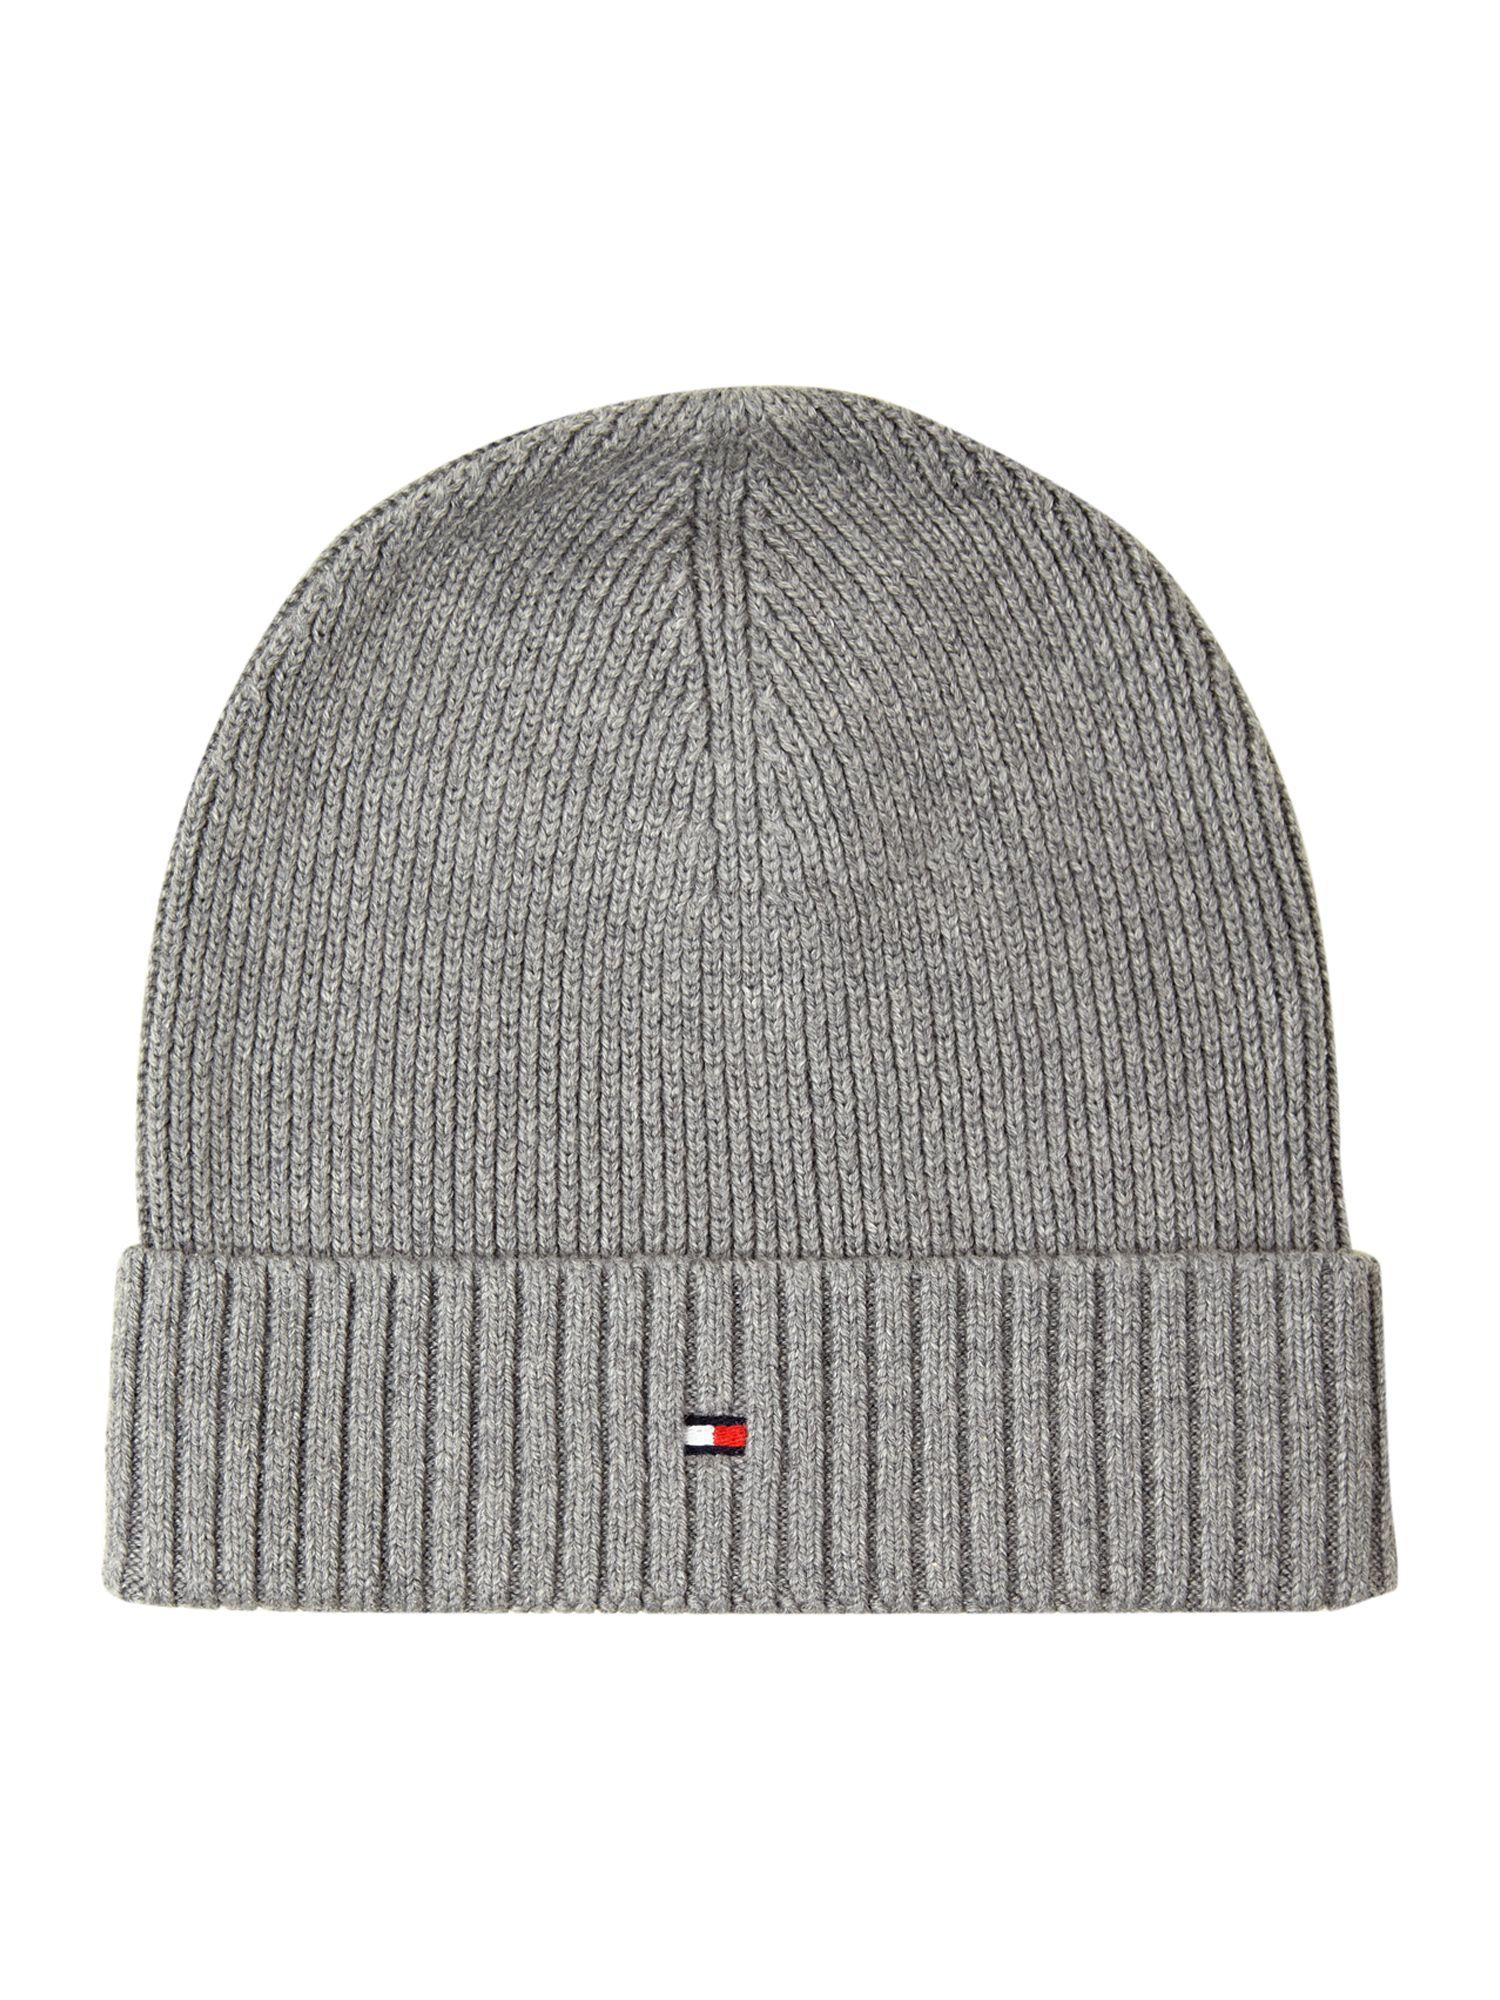 Lyst Tommy Hilfiger Cotton Cashmere Beanie Hat In Gray